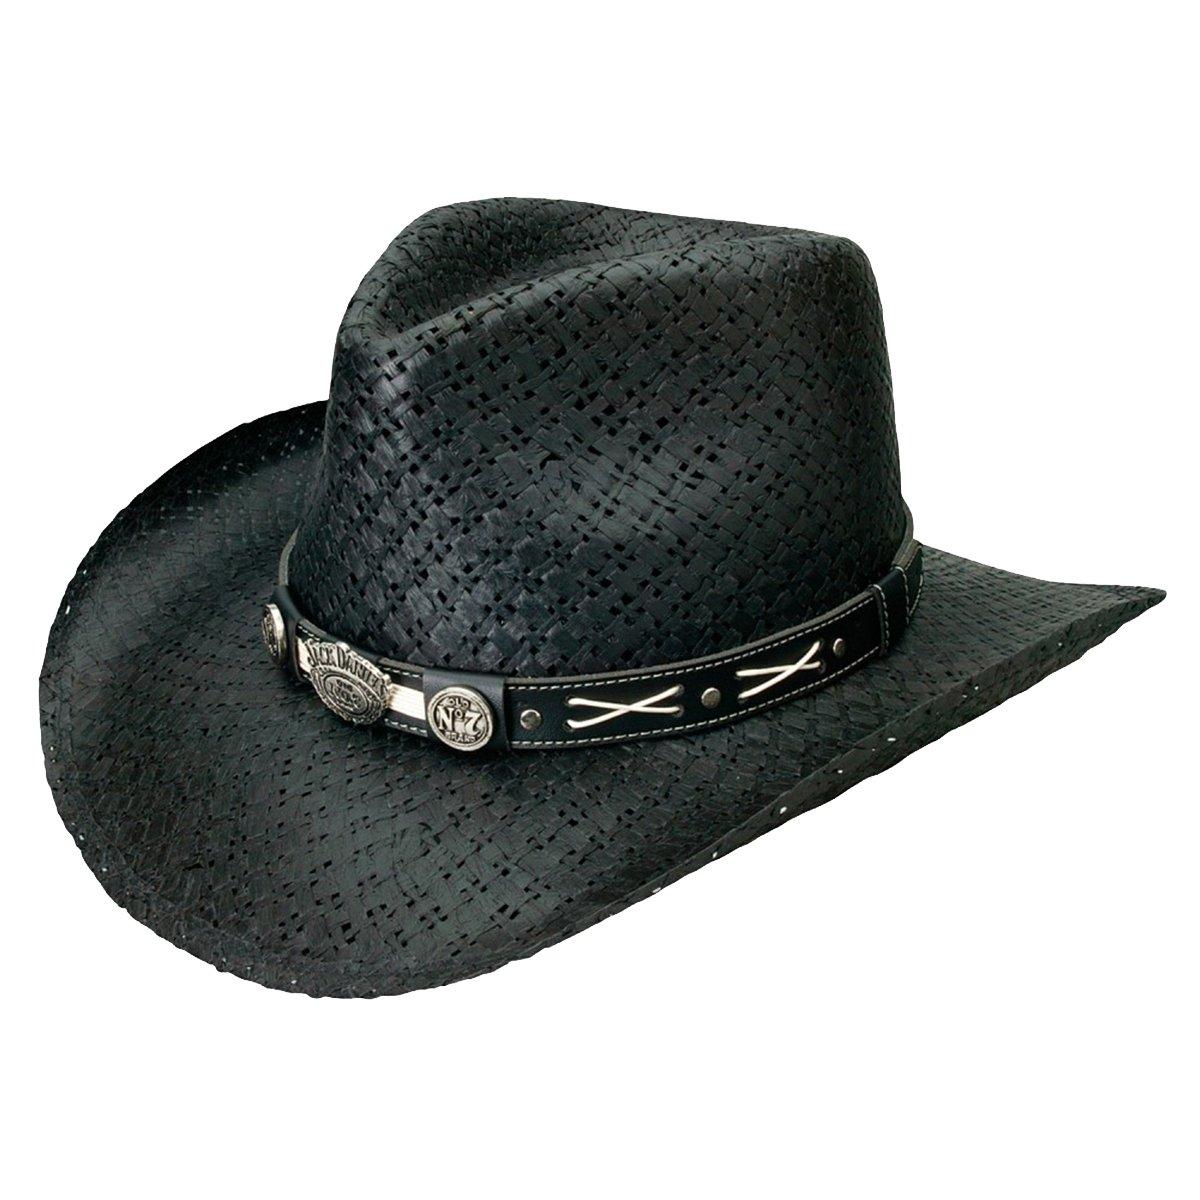 Jack Daniel Mens Daniels Soft Toyo Straw Cowboy Hat Jd03-705